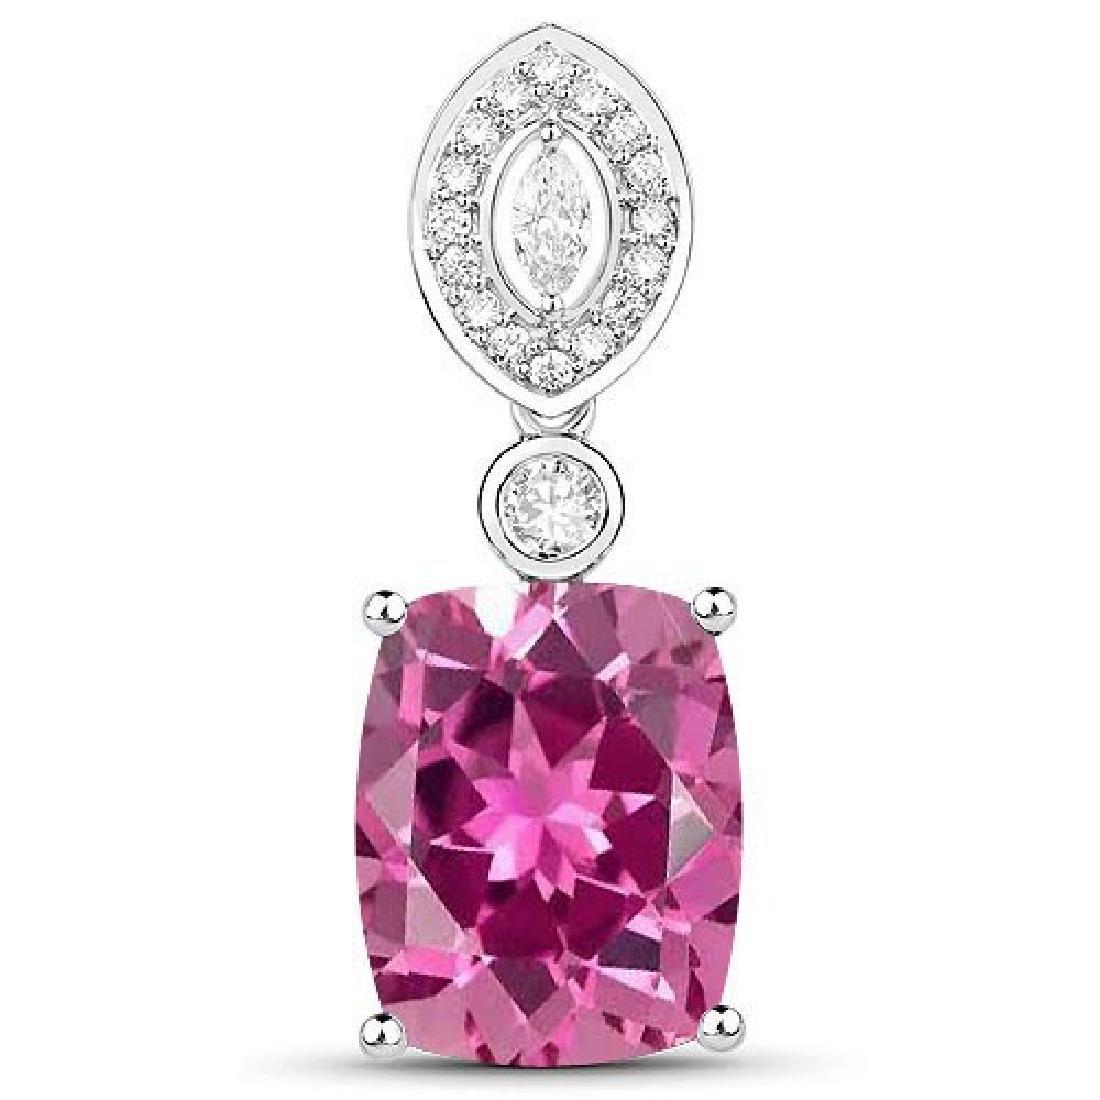 Certified 5.20 CTW Genuine Pink tourmaline And Diamond